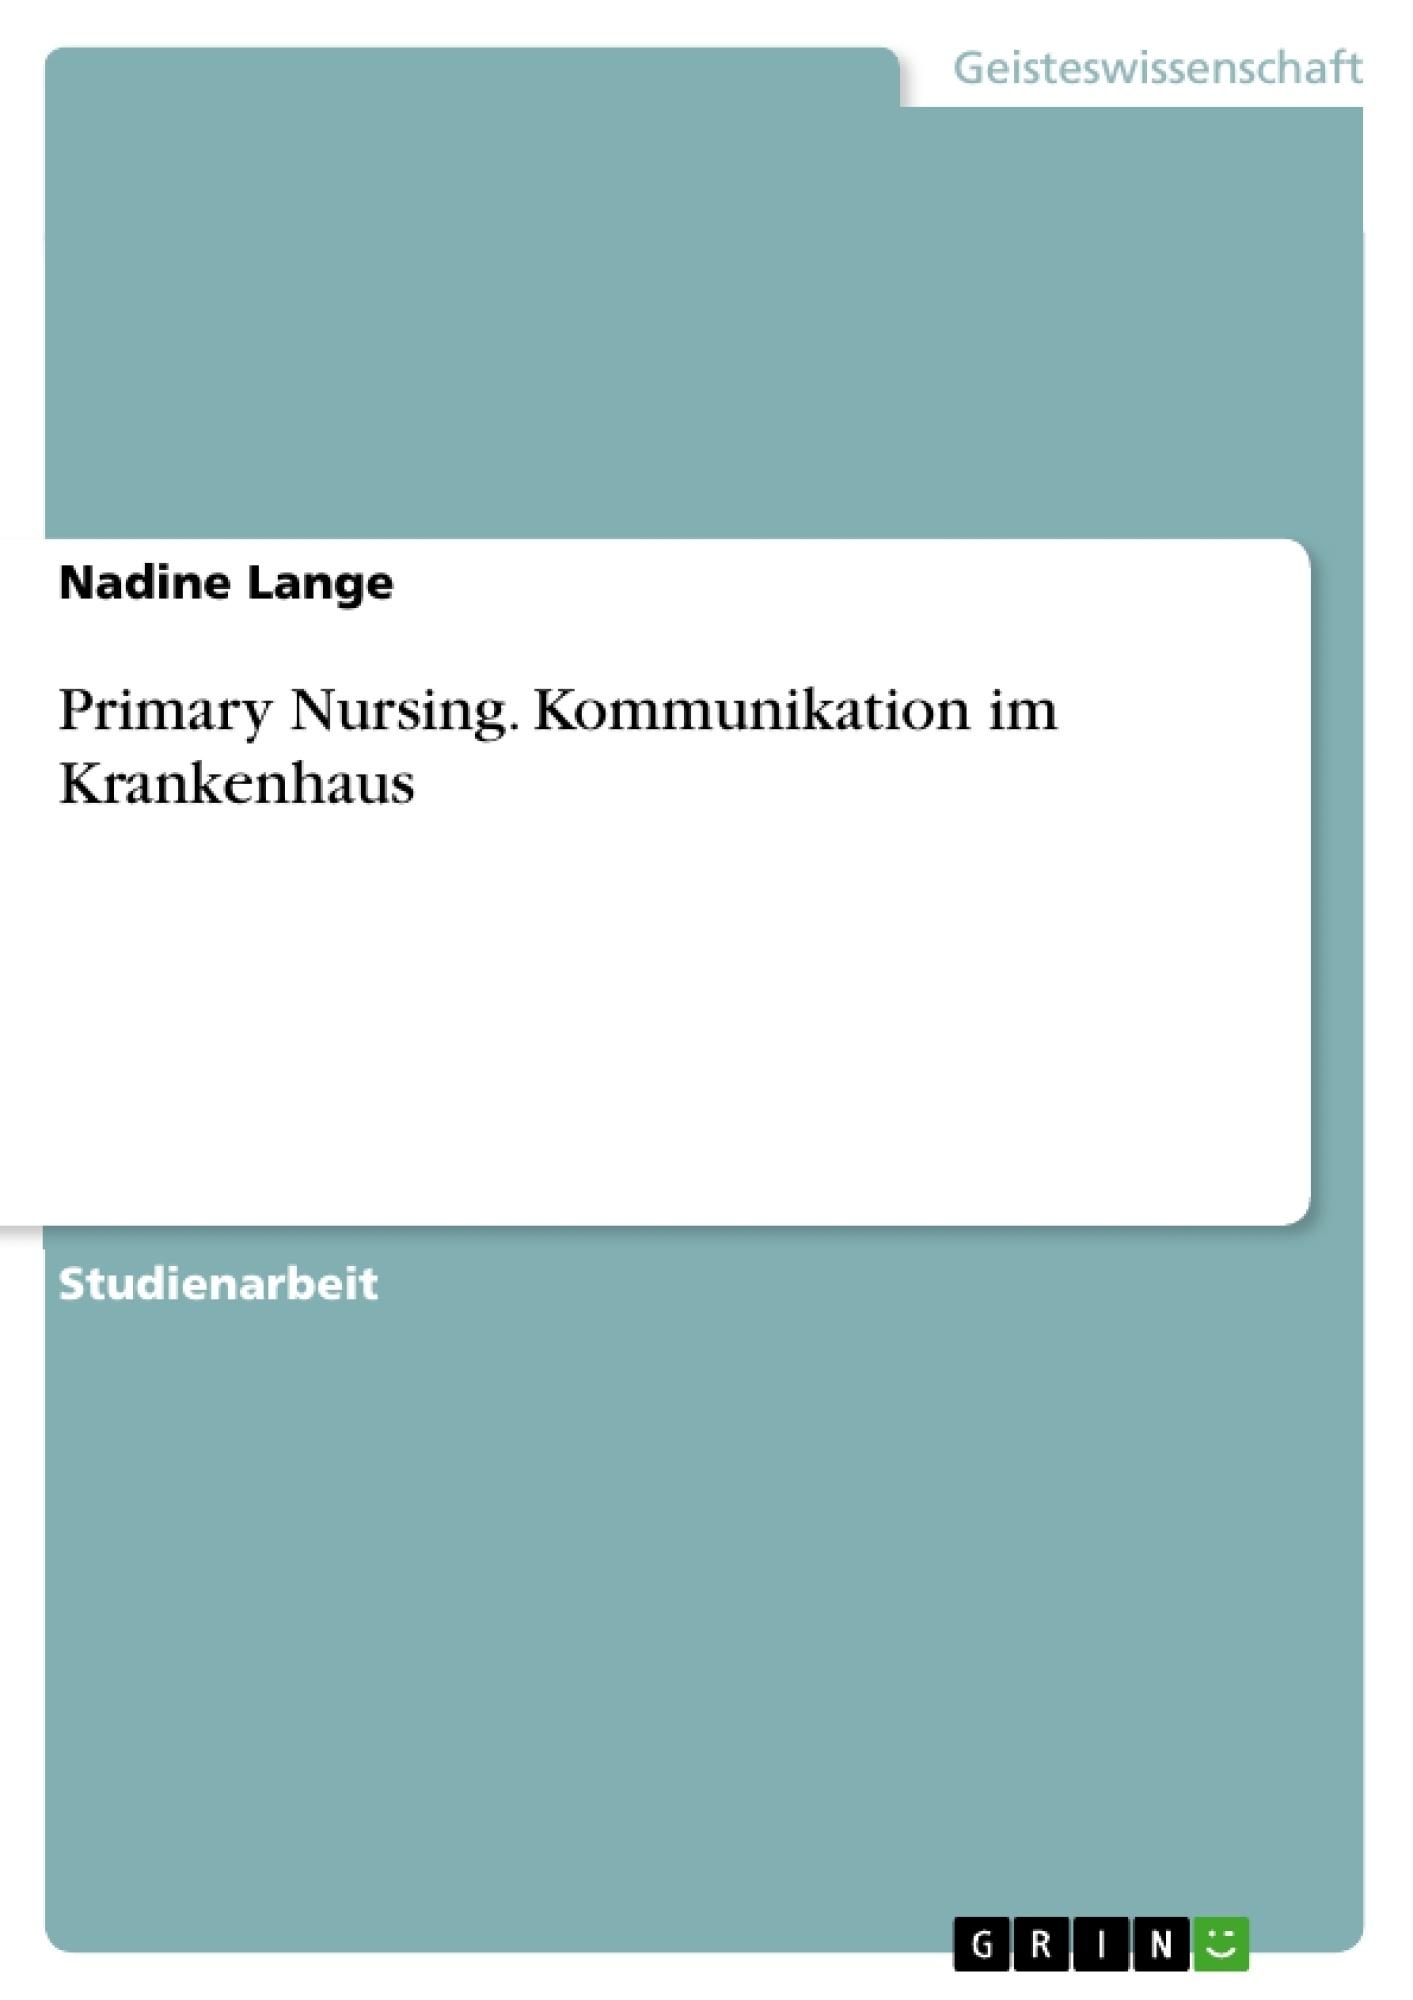 Titel: Primary Nursing. Kommunikation im Krankenhaus